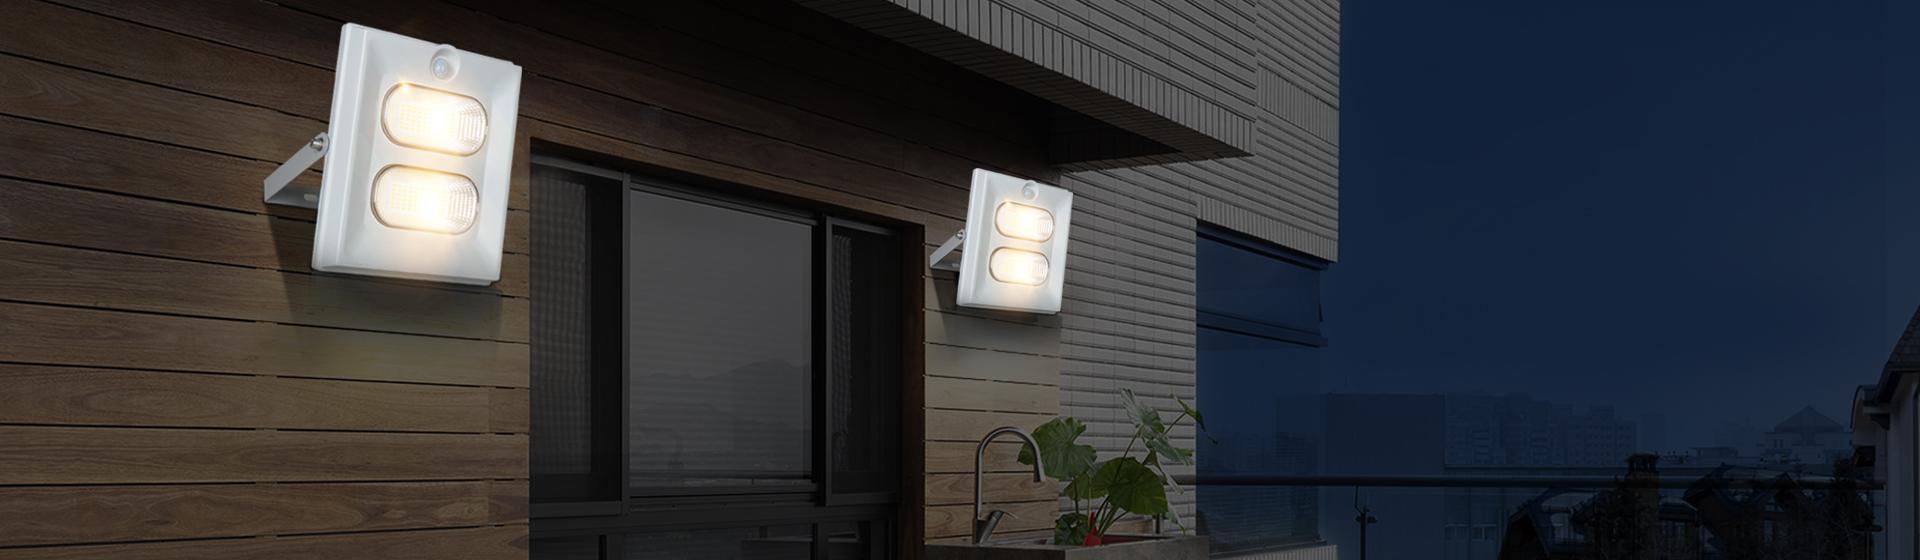 application-Popular Light Companies And Landscape Lighting Supply-ALLTOP-img